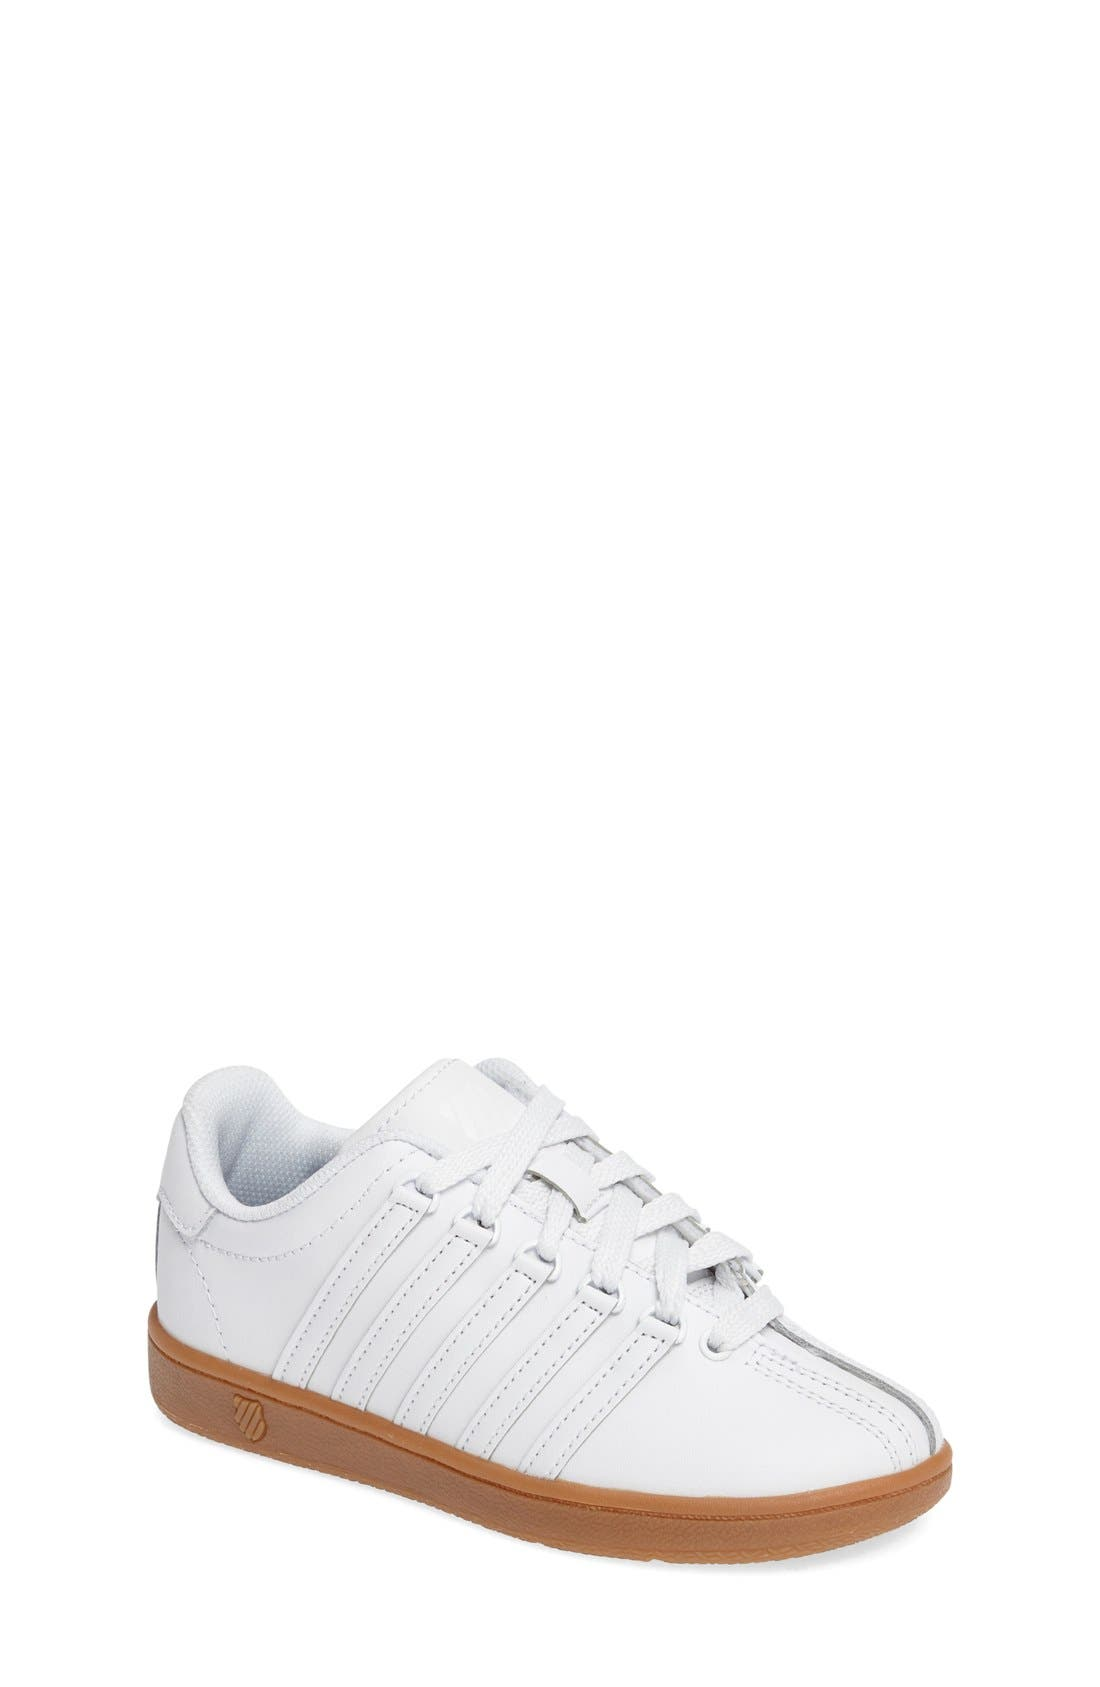 'Classic' Sneaker,                             Main thumbnail 1, color,                             White/ Gum